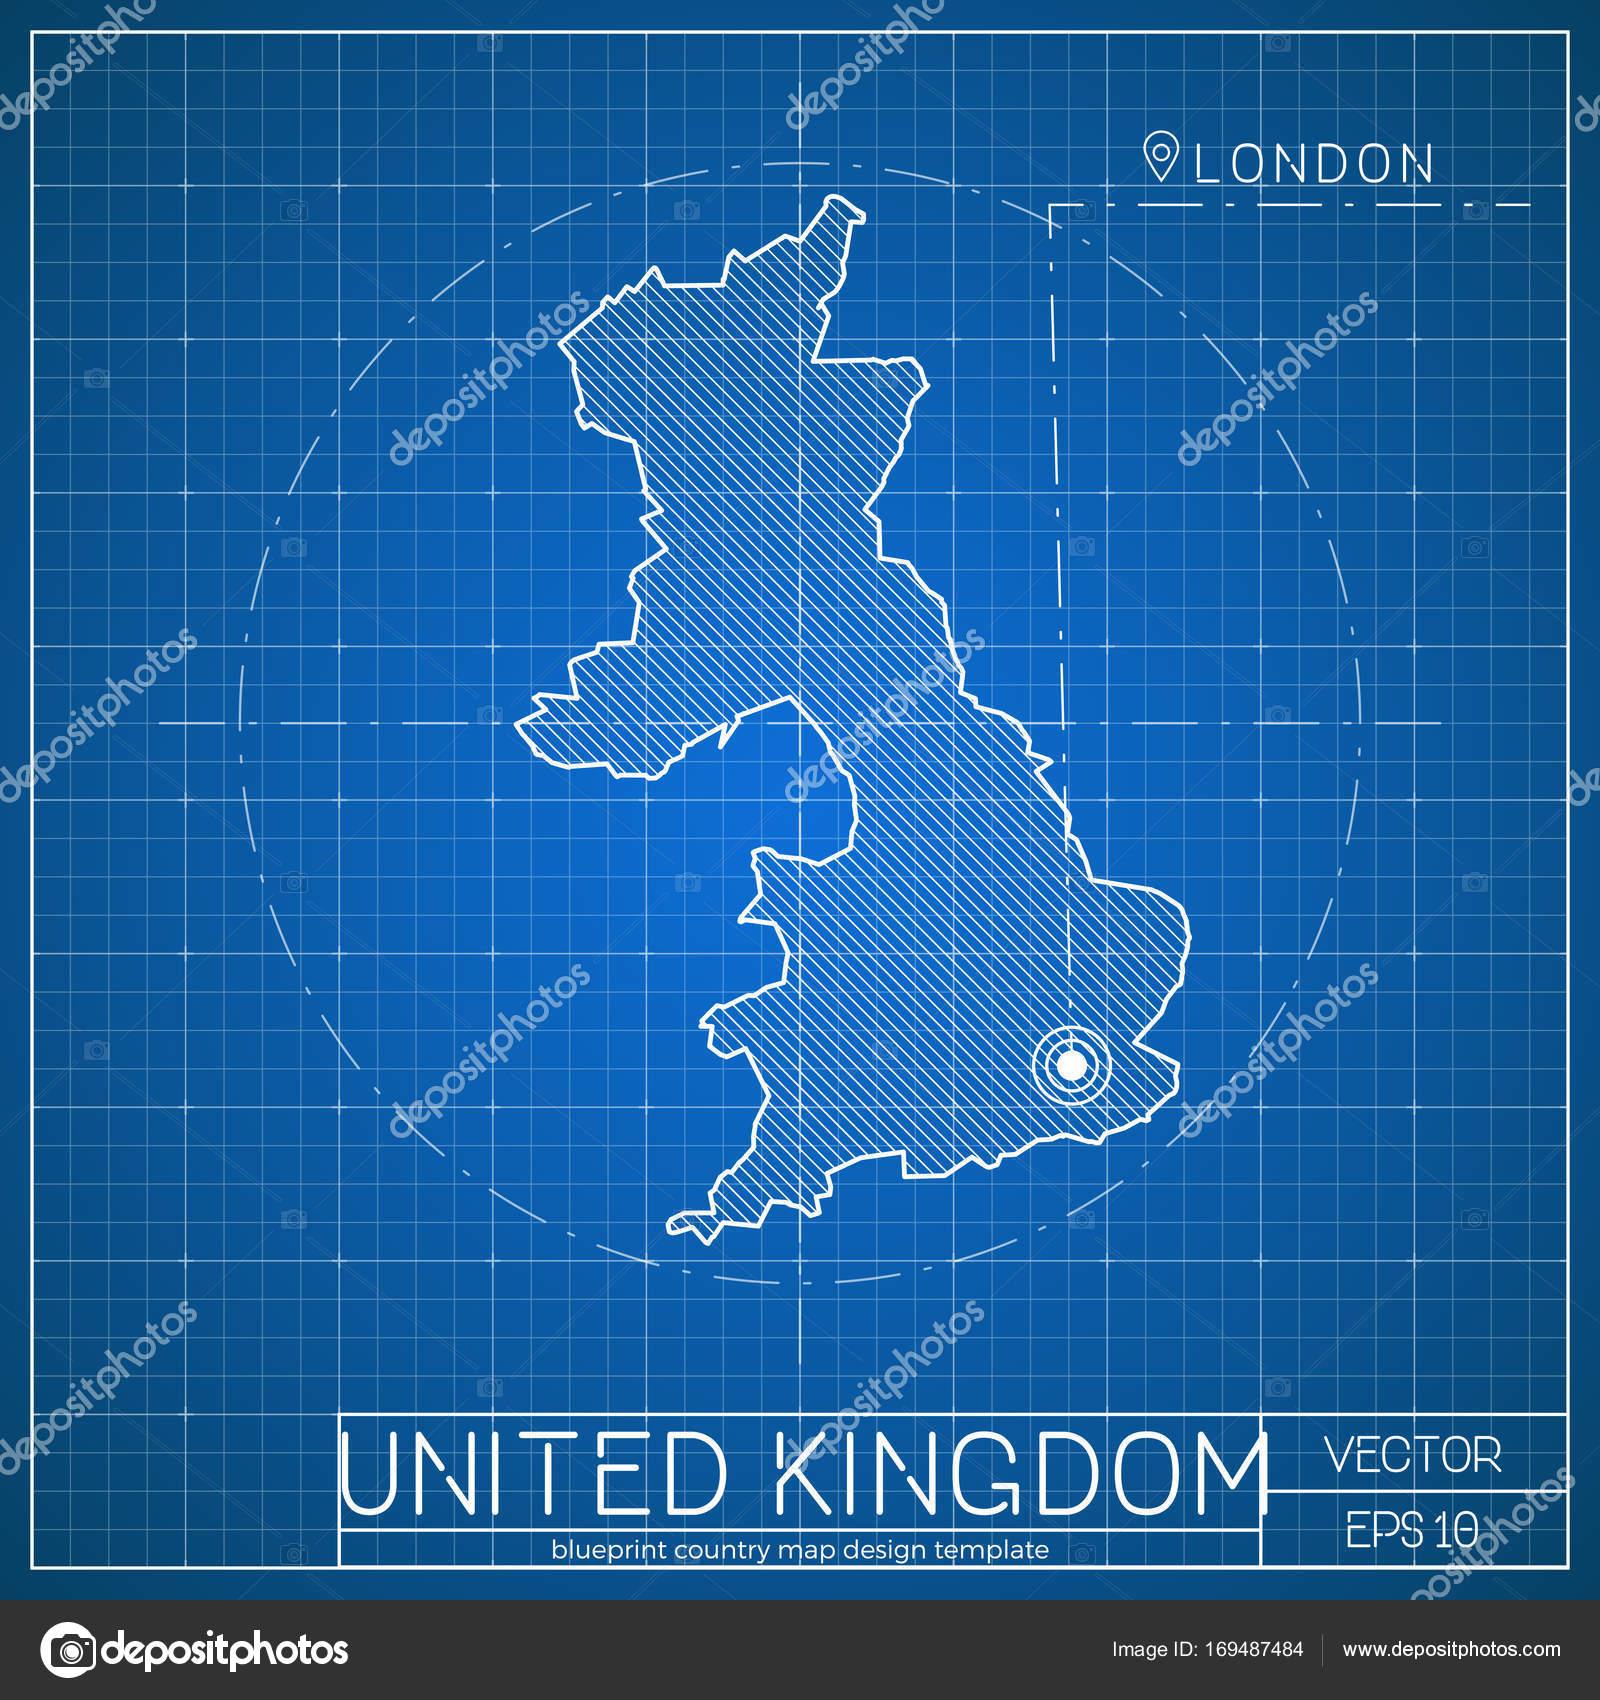 United Kingdom Blueprint Map Template With Capital City London Marked On  Blueprint British Map U2014 Stock